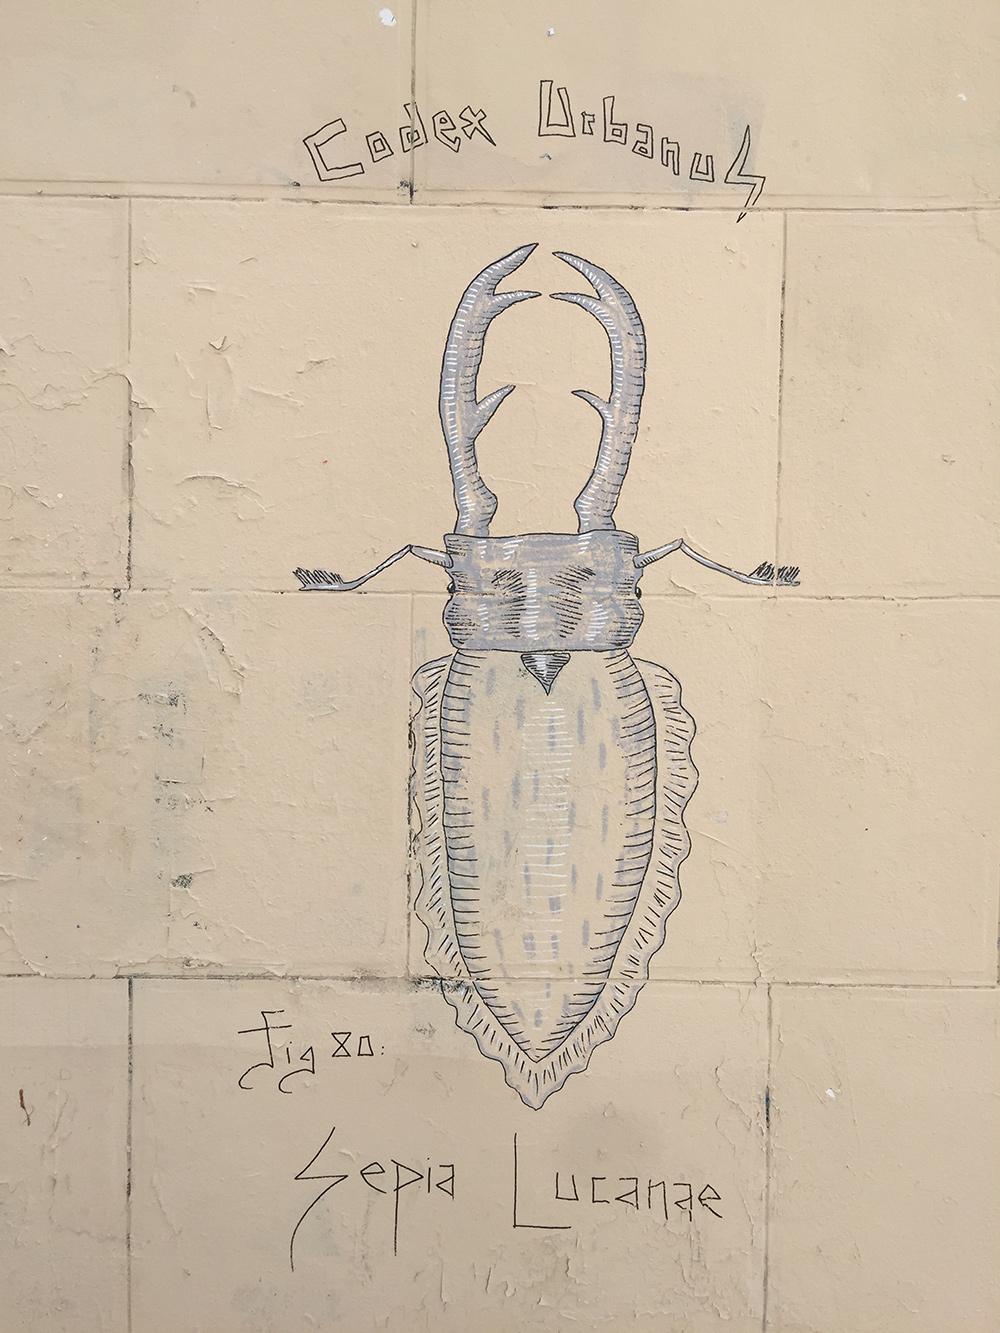 Codex Urbanus, Sepia Lucanæ, rue Chappe, Montmartre Street Art